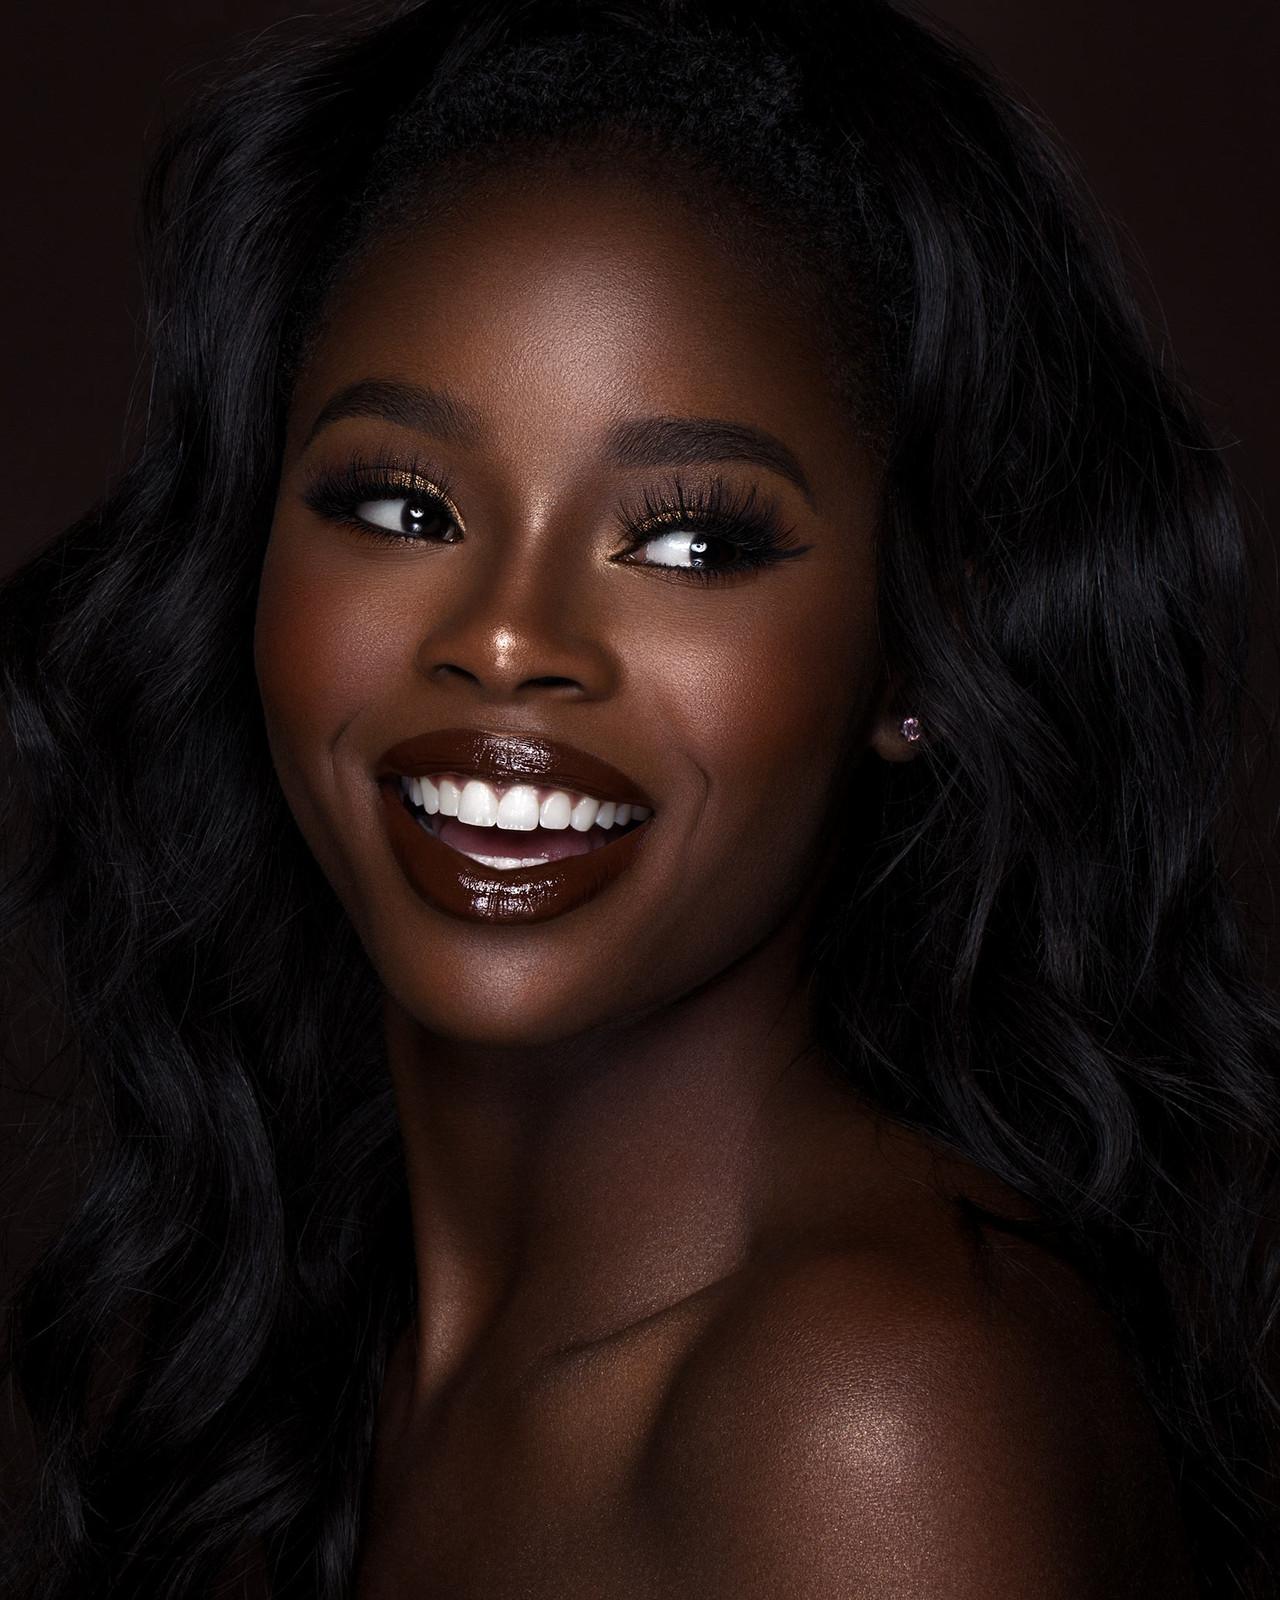 Dallas Beauty Lifestyle Fashion Blog: Dallas Beauty Photographer